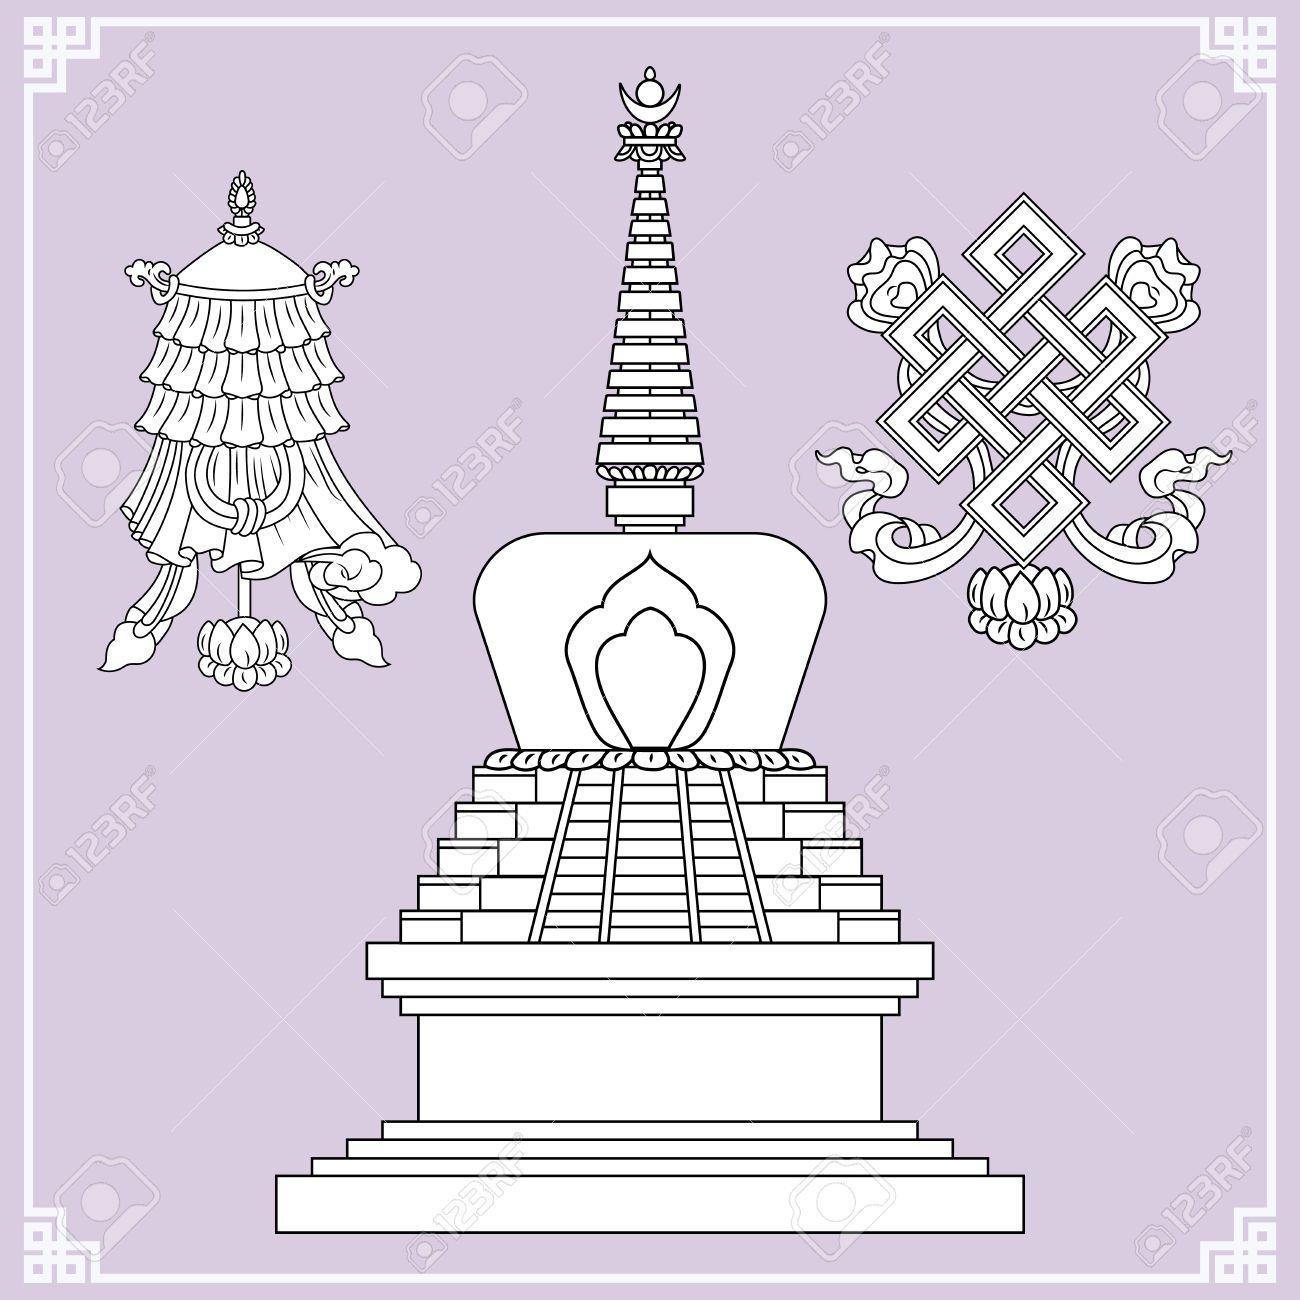 Buddhist Symbols Symbols Wisdom Enlightenment Nepal Tibet